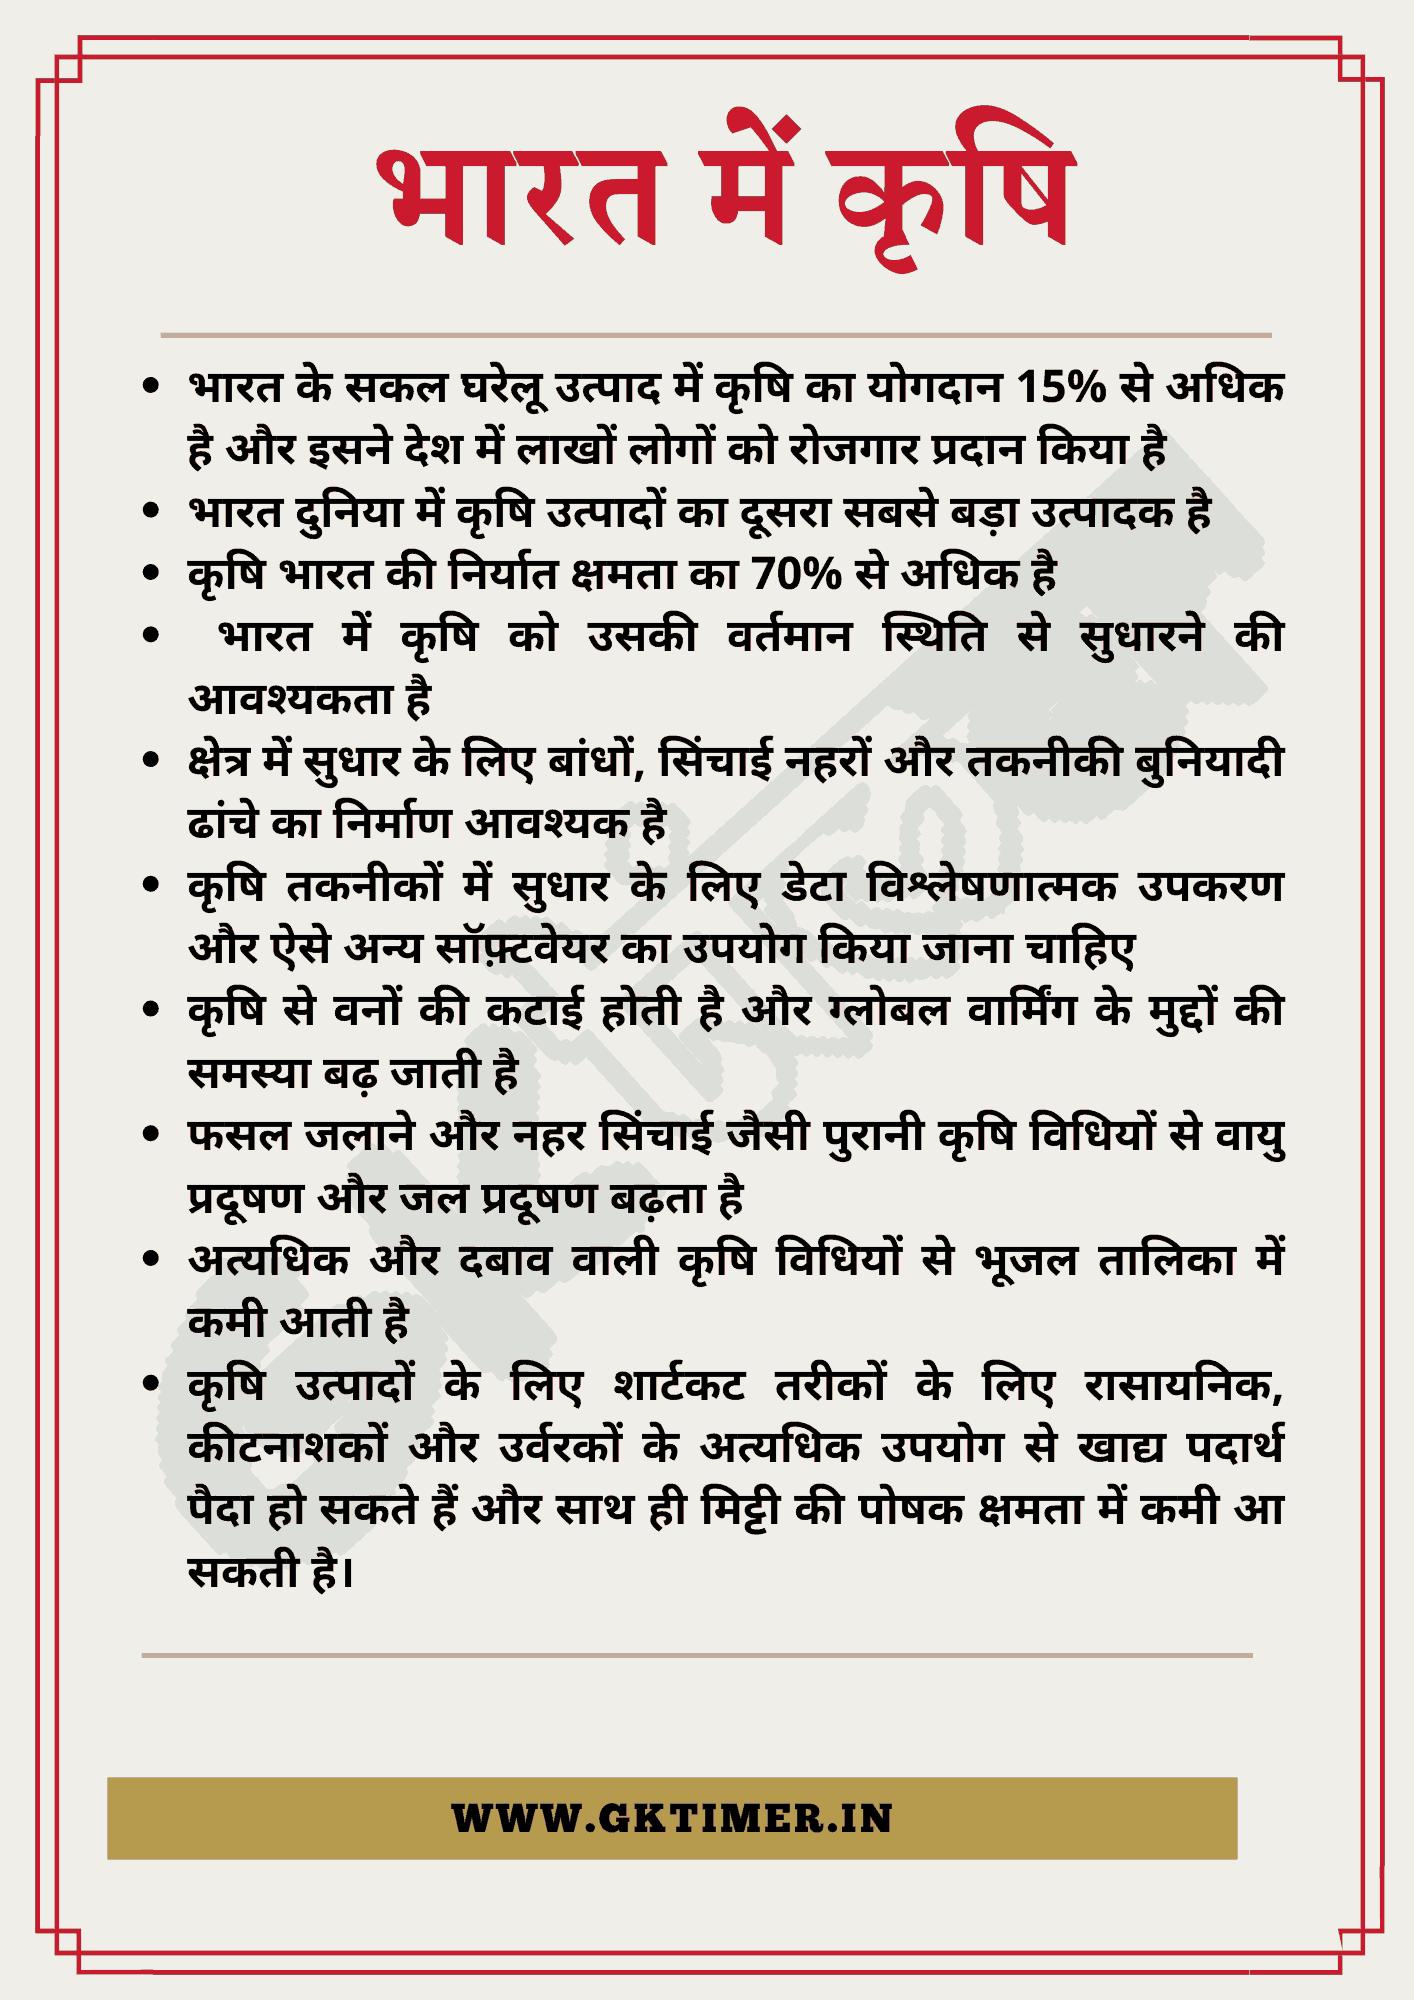 भारत में कृषि निबंध | Long and Short Essay on Agriculture in India in Hindi | 10 Lines on Agriculture in India in Hindi